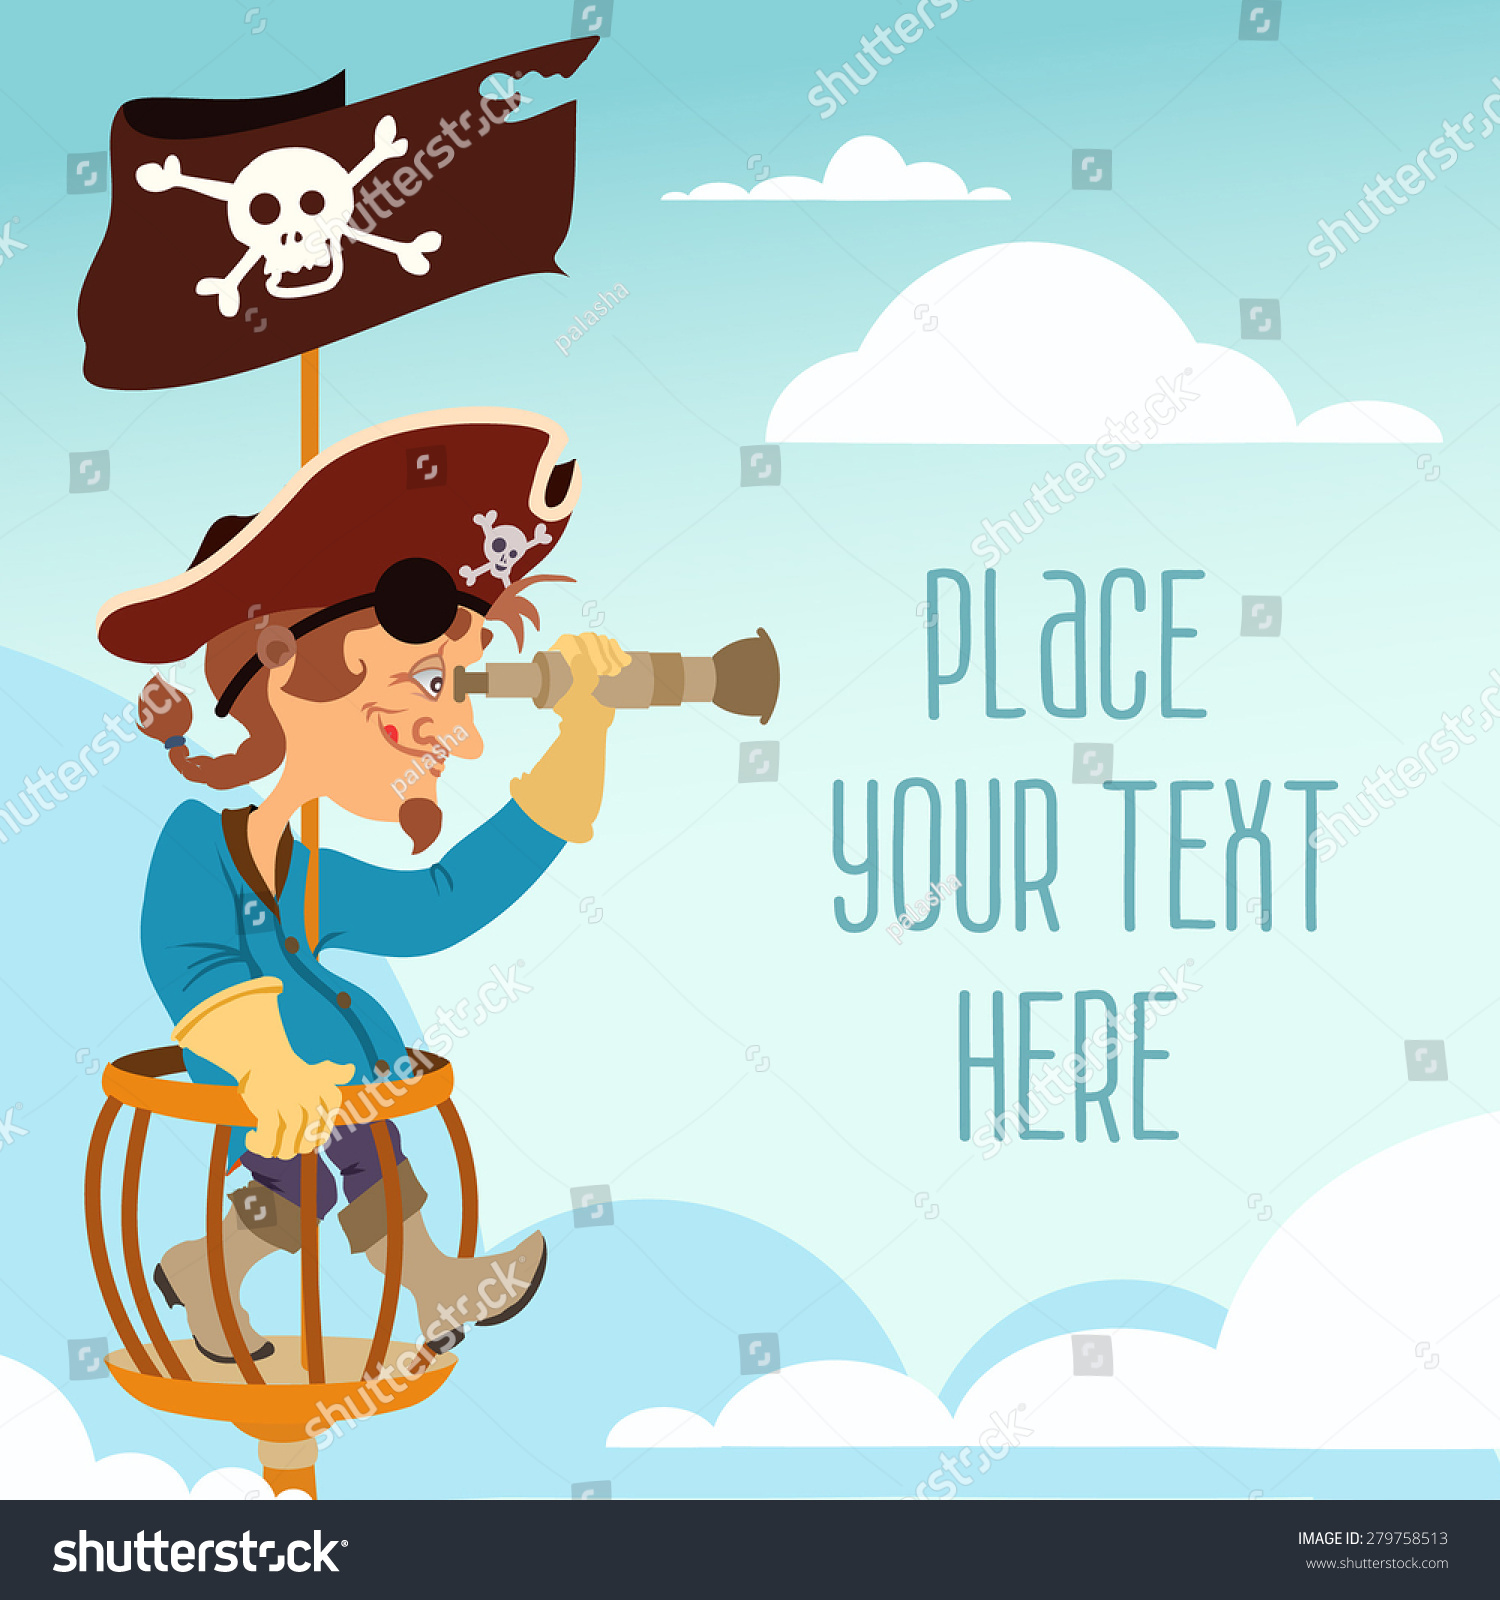 cute cartoon pirate man looking through a spyglass